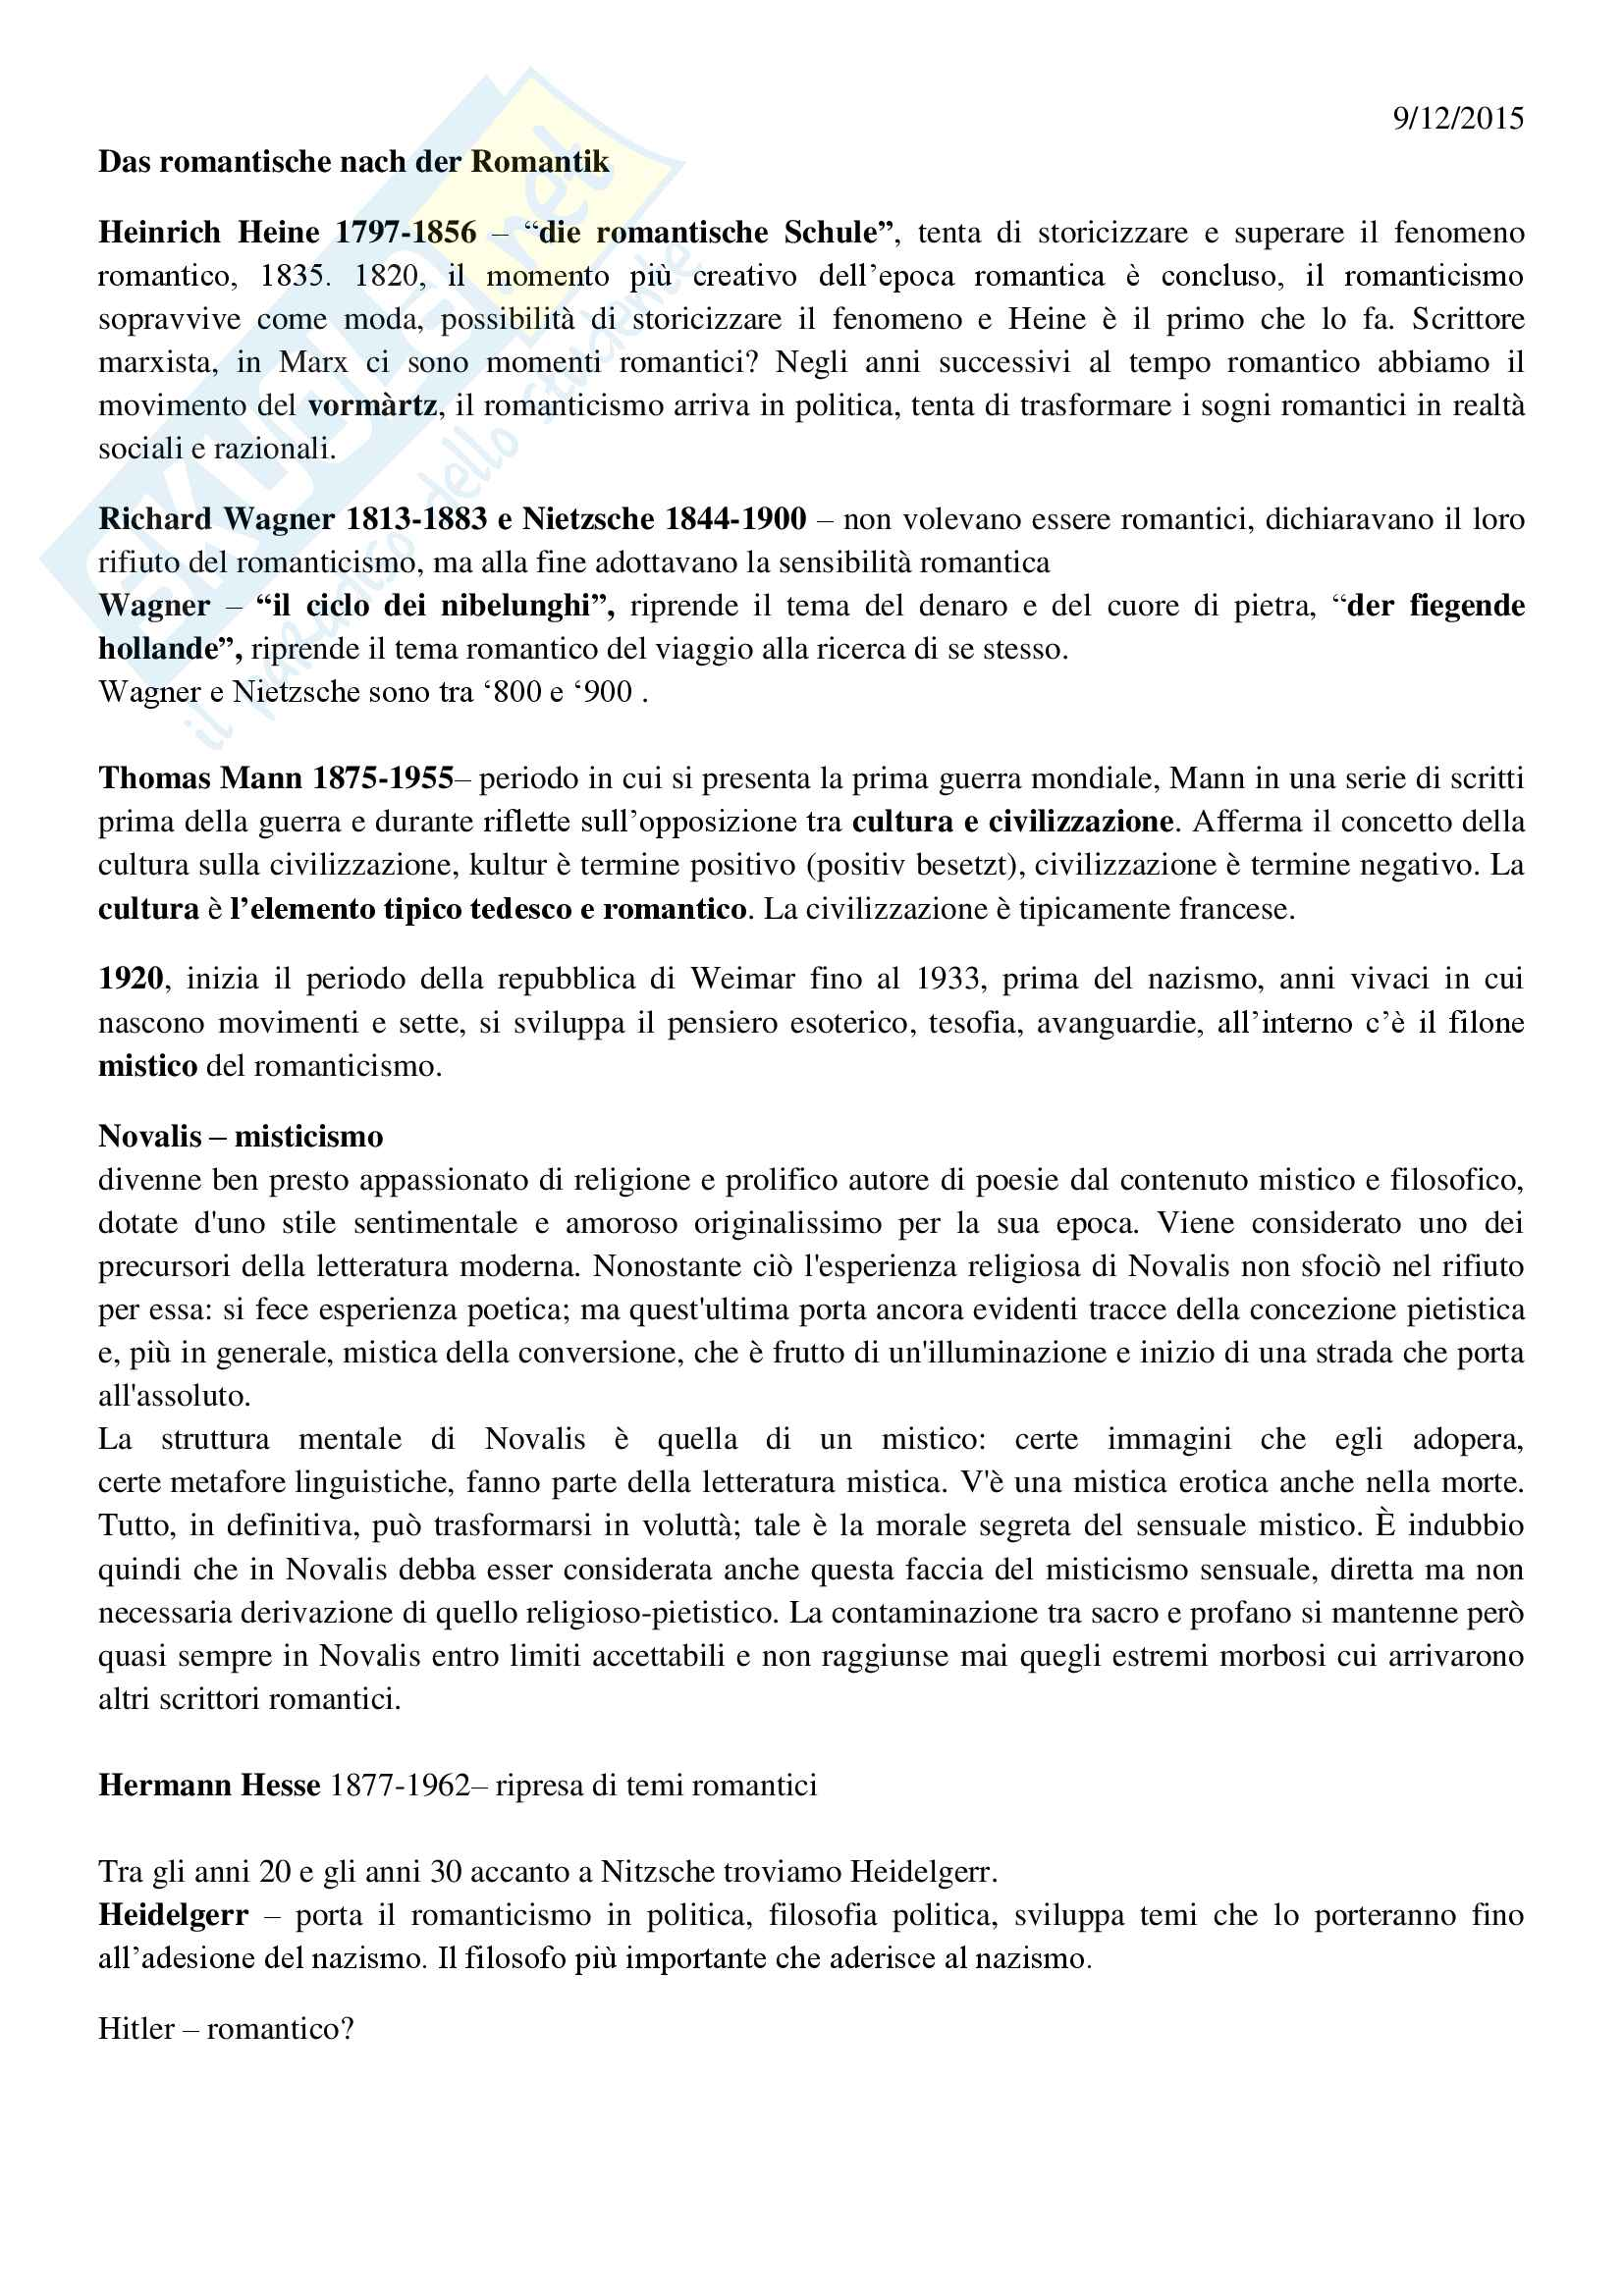 Letteratura tedesca 3 Pag. 26